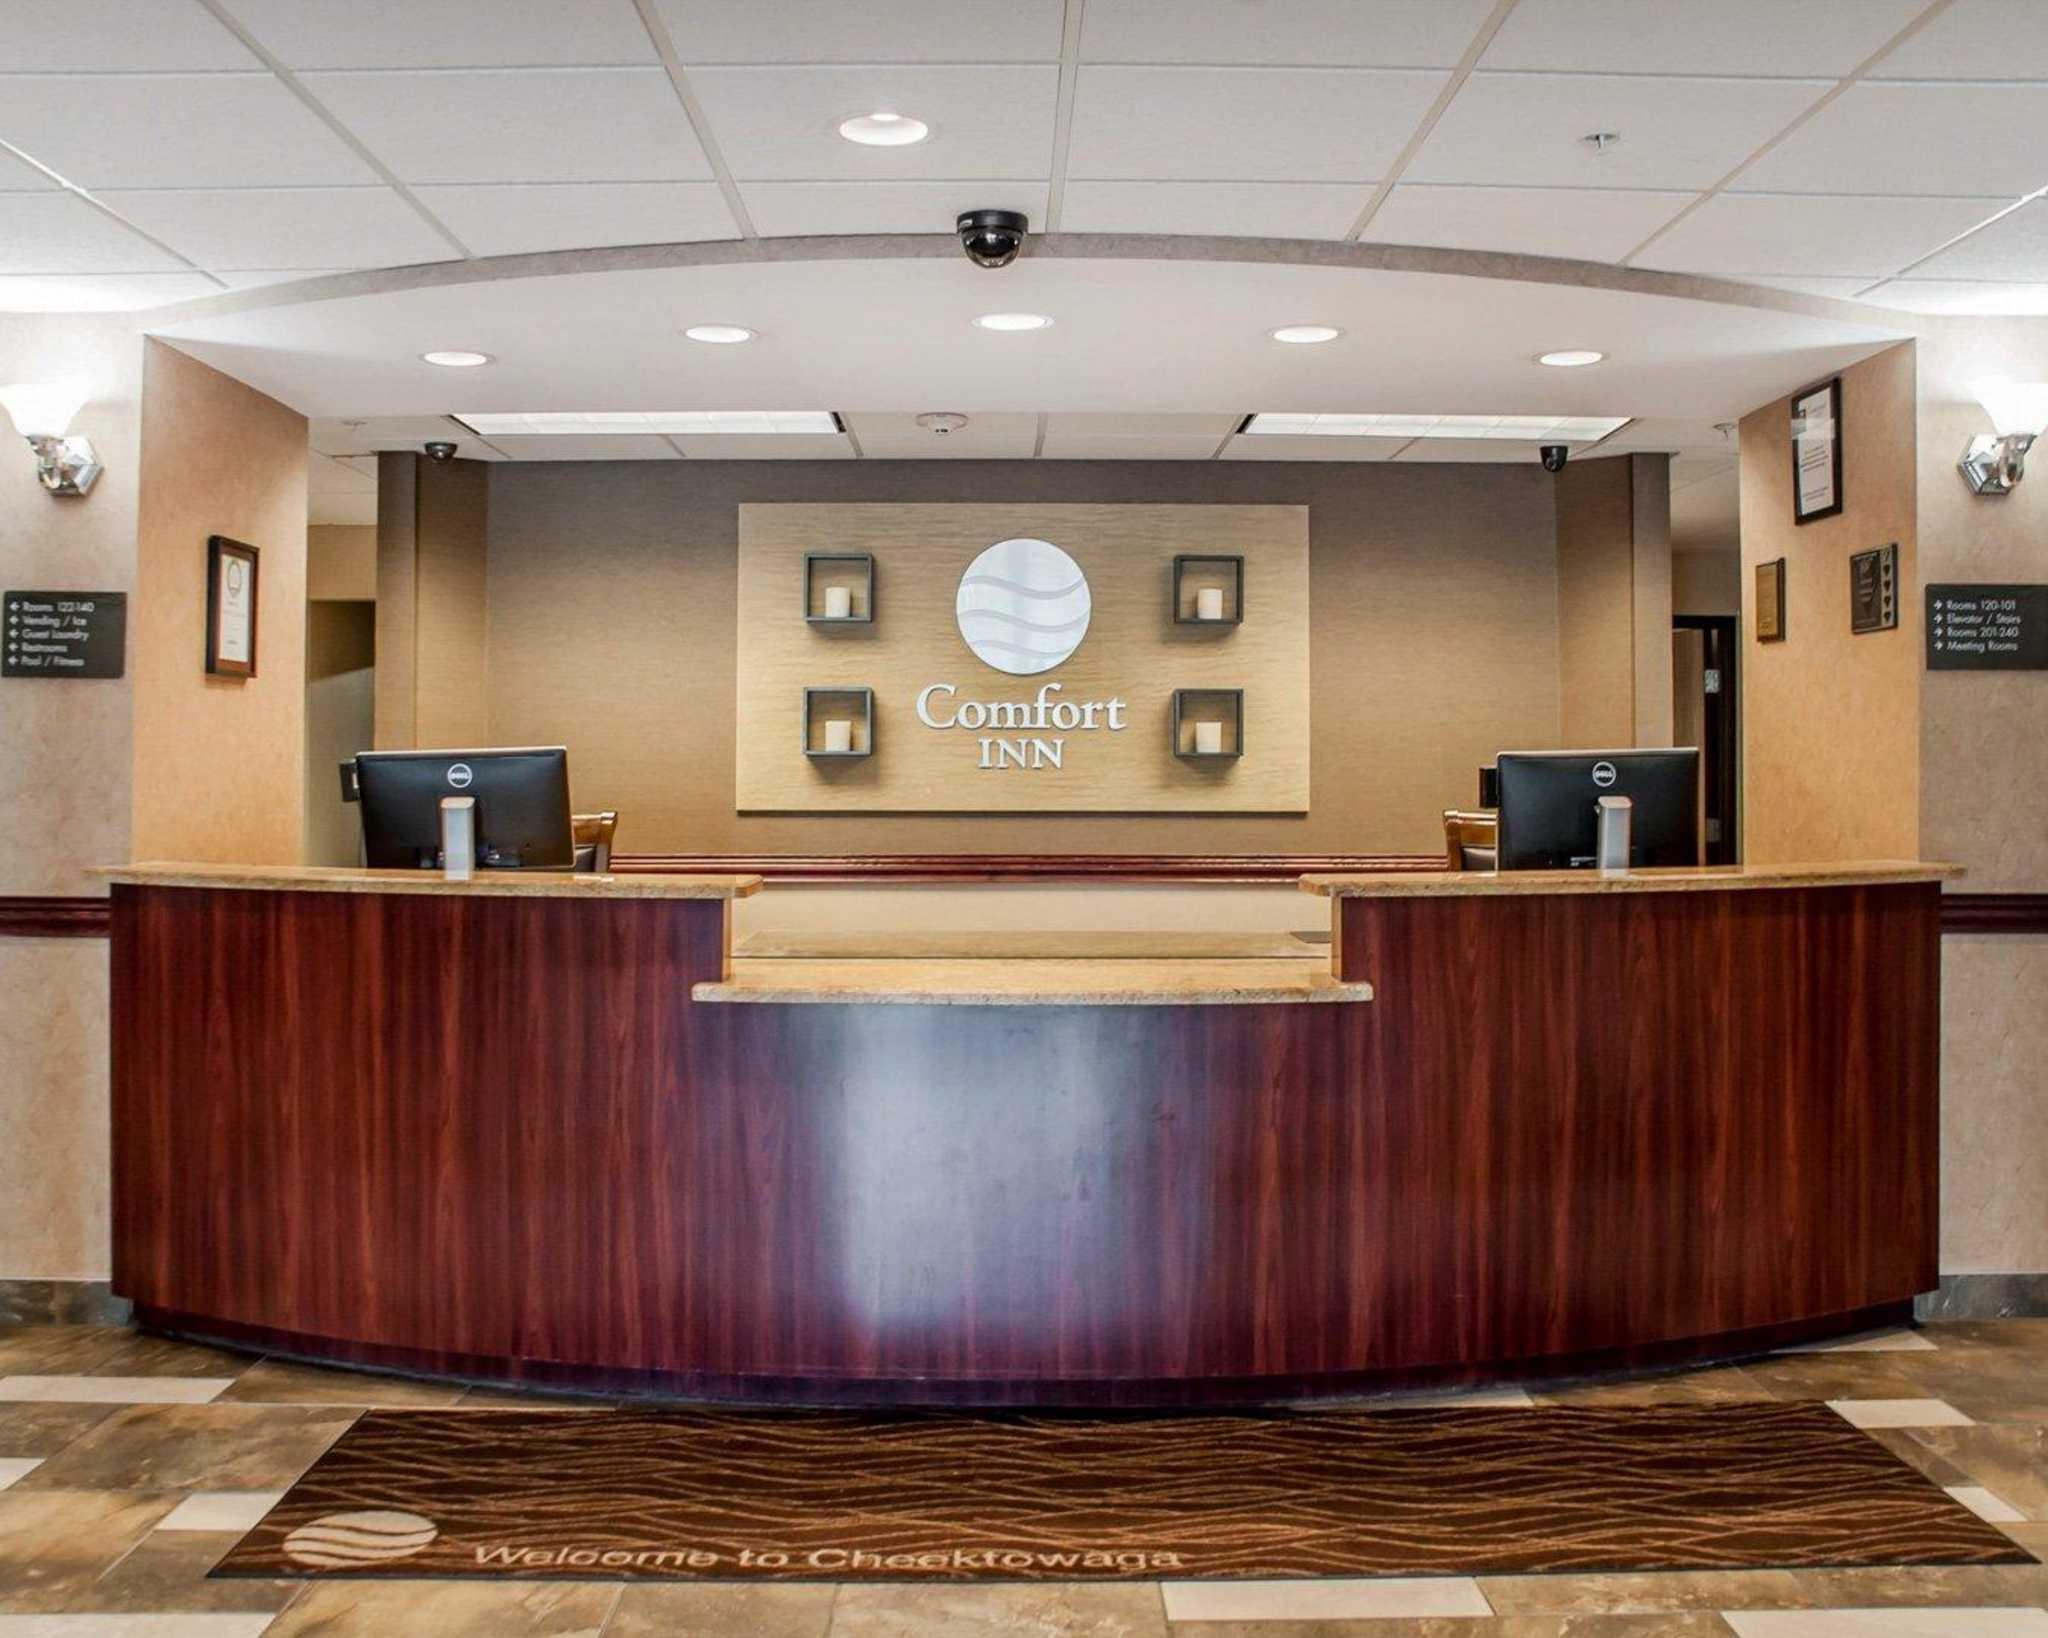 Comfort Inn Near Walden Galleria Mall image 21